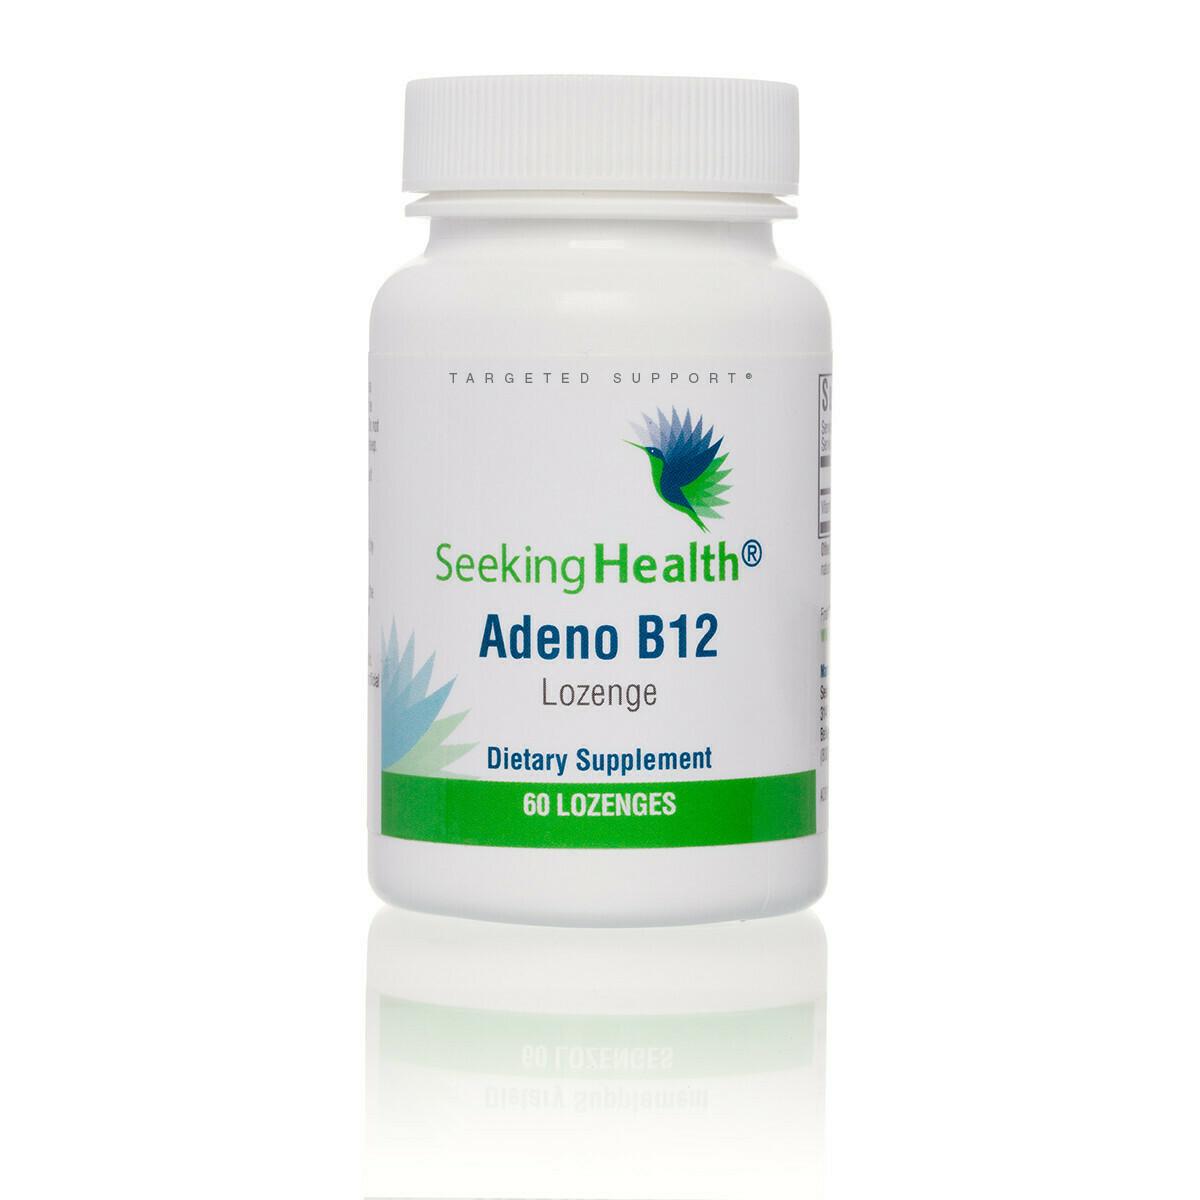 ADENO B12 - 60 LOZENGES  Seeking Health